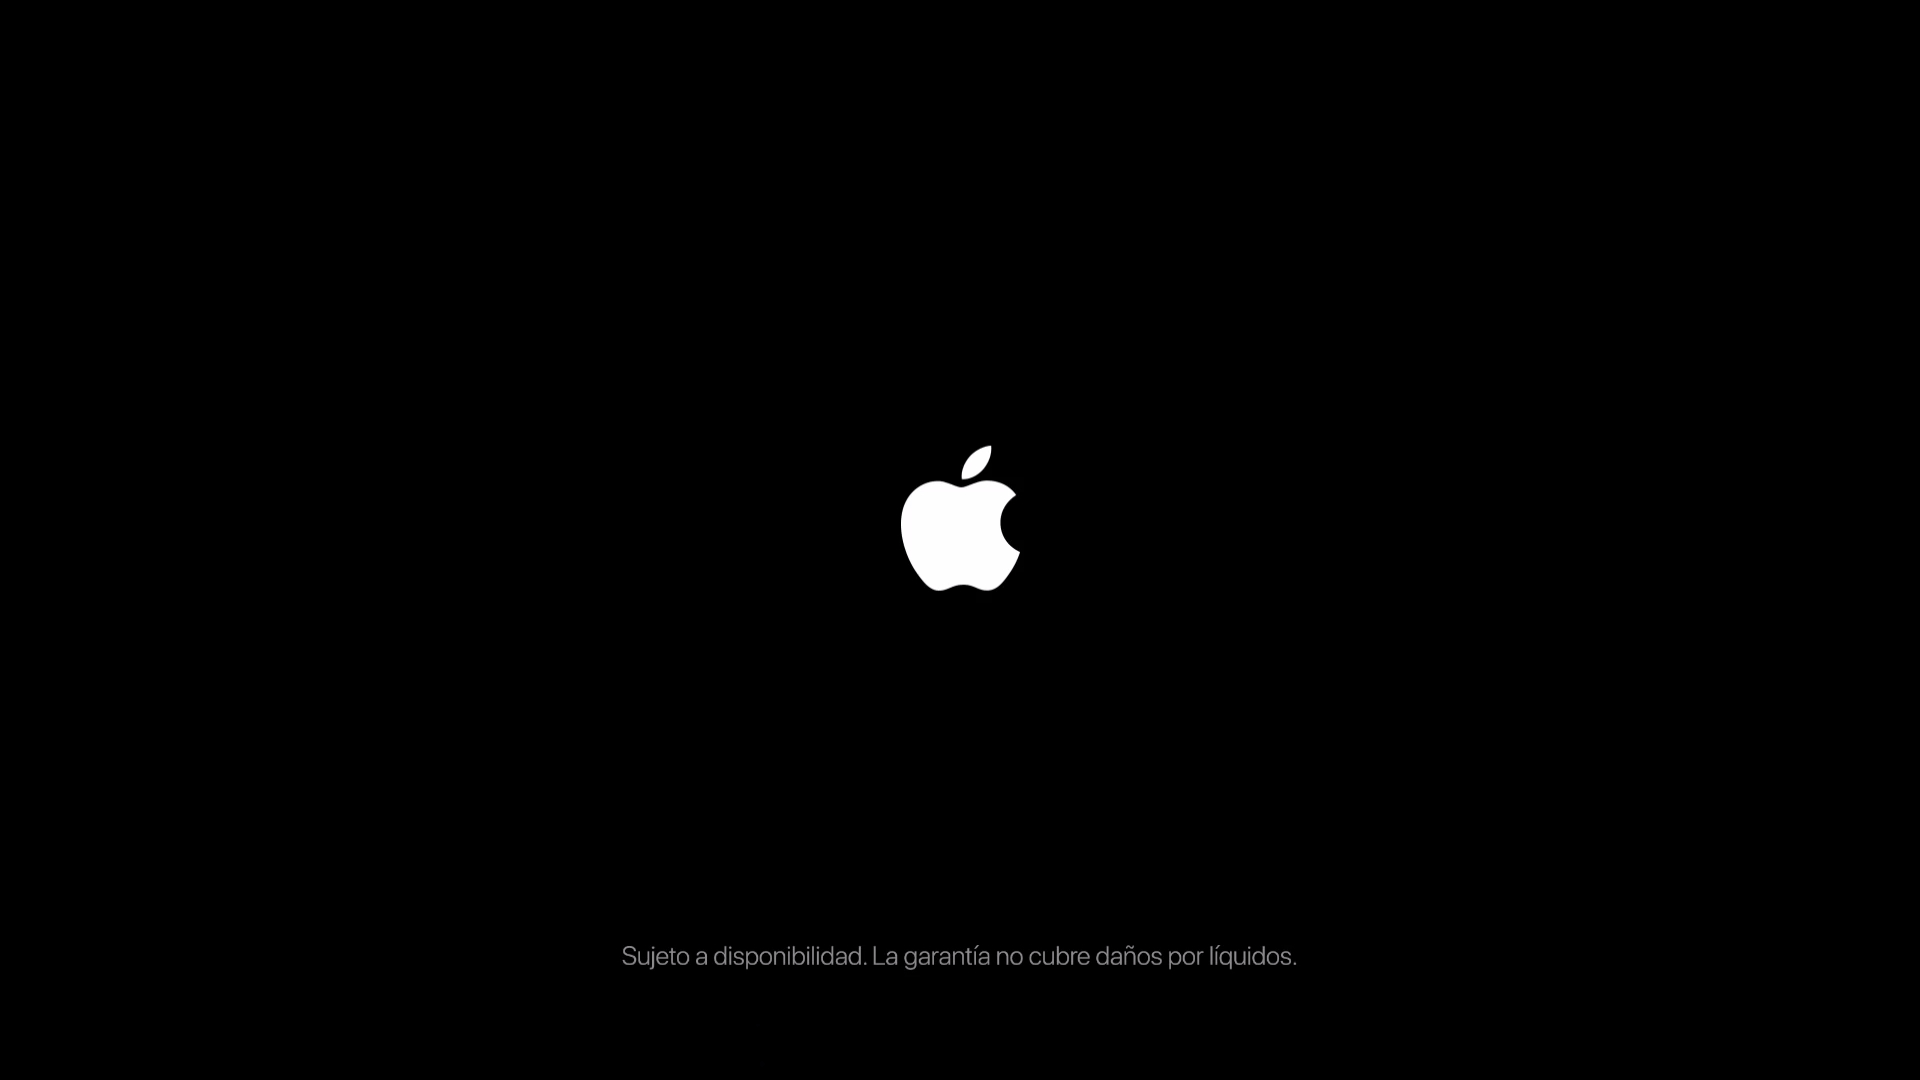 apple-garantia-iphone-7-agua-liquidos-youtu-be-fhop7i5buro